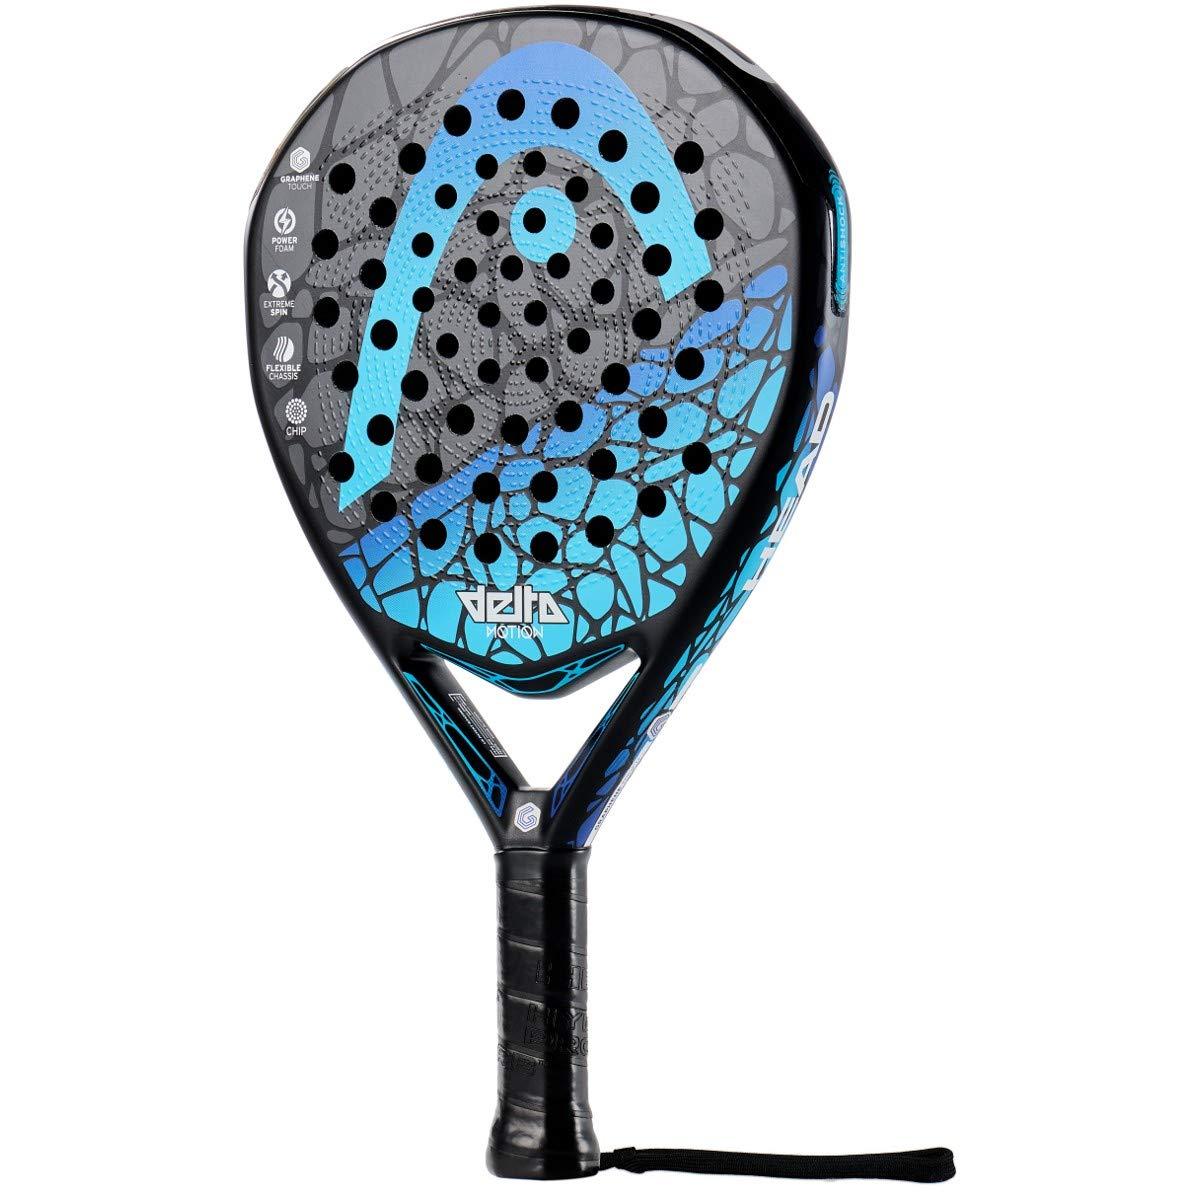 Head Pala Padel Graphene Touch Delta Motion Blue 2019: Amazon.es: Deportes y aire libre